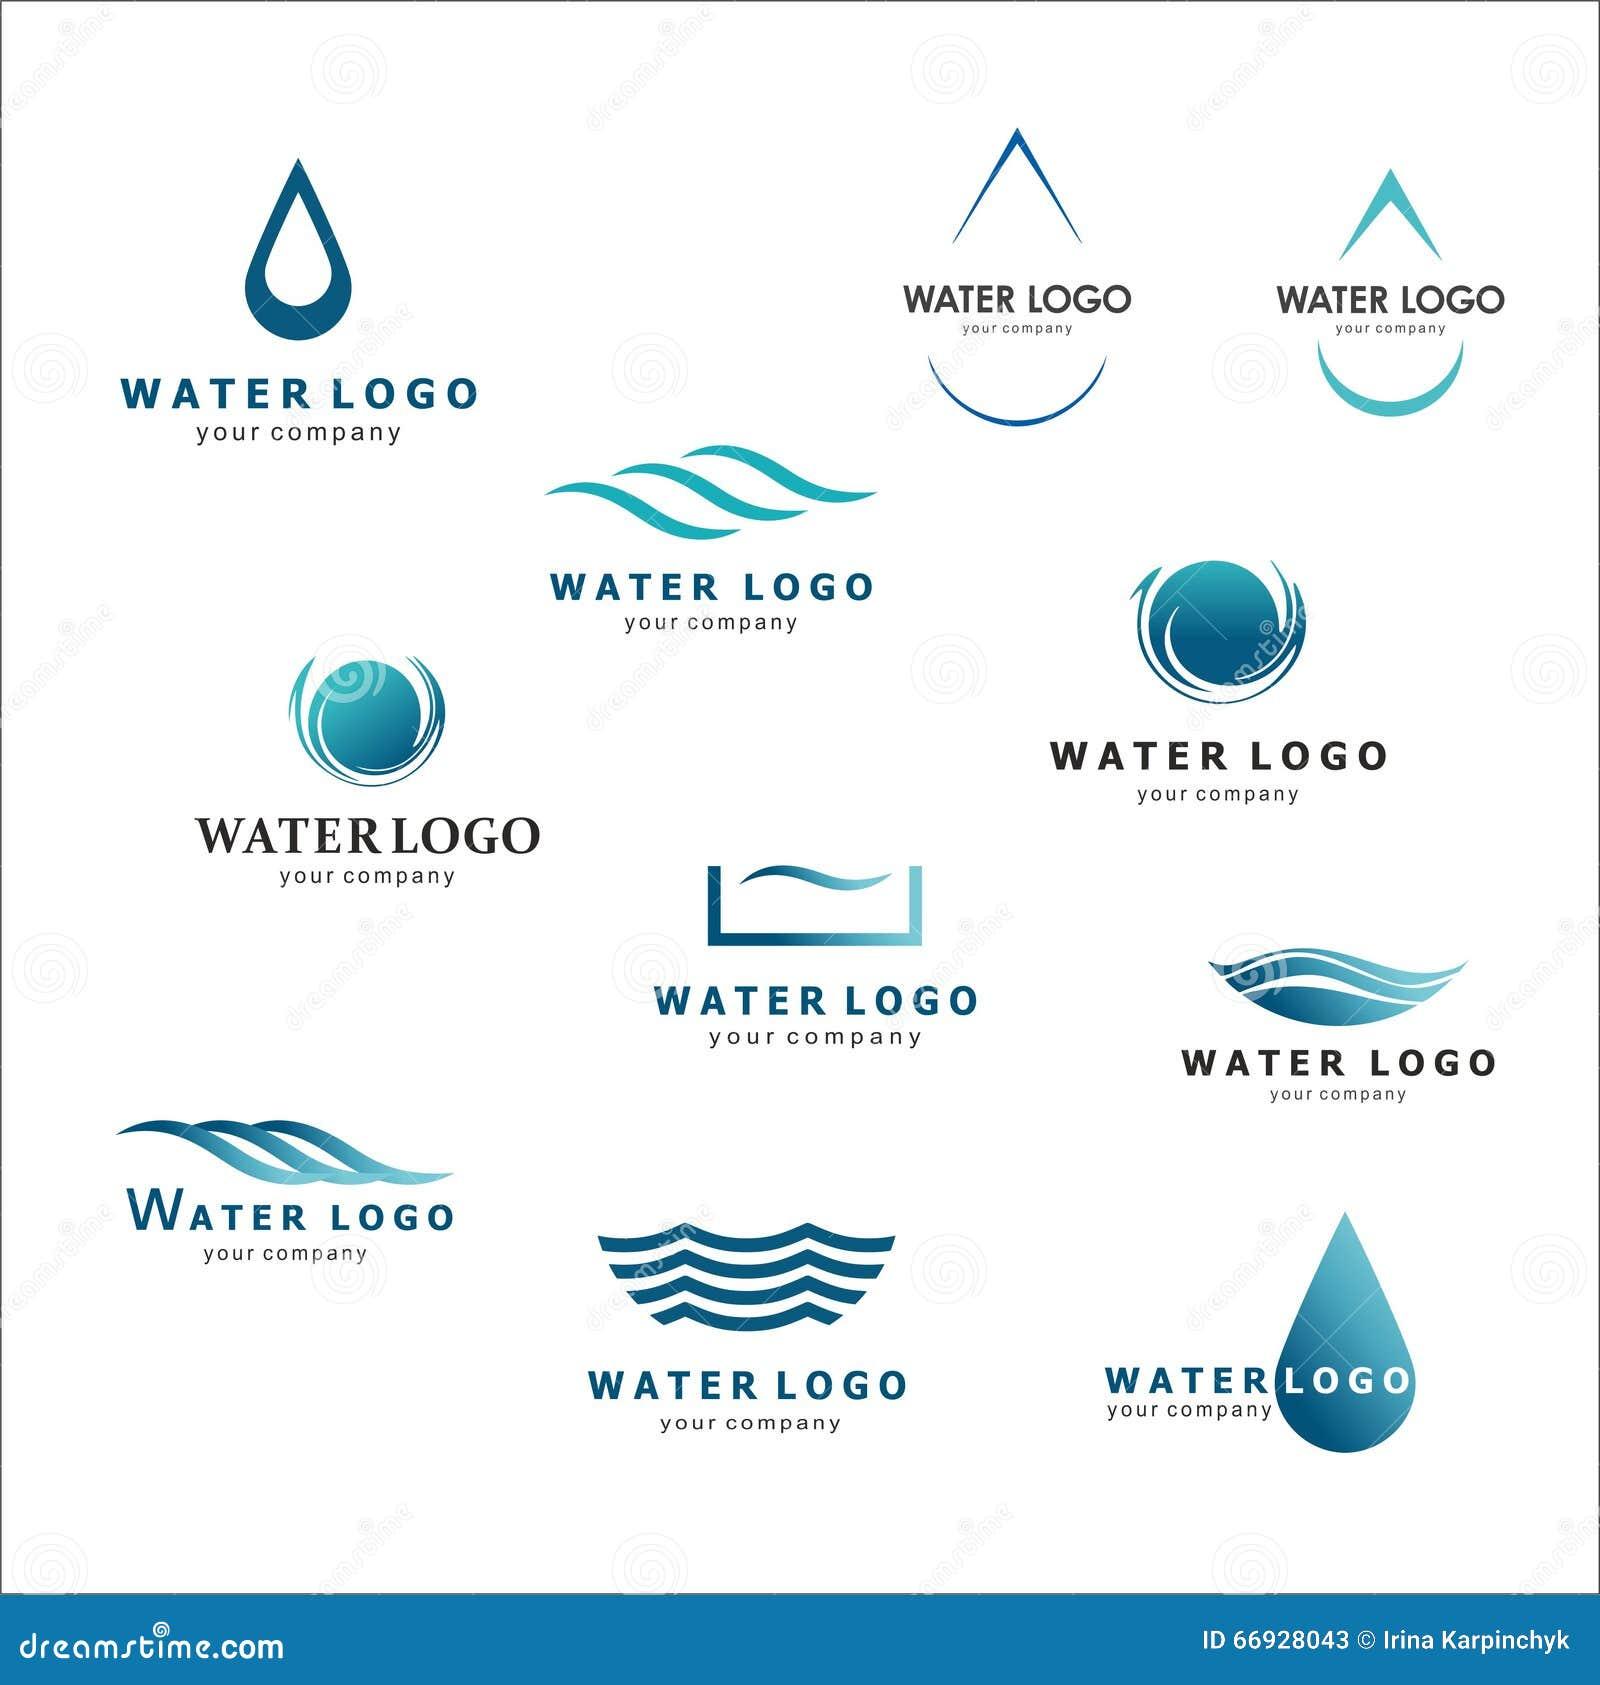 Water Logos Royalty Free Stock Photography - Image: 8489997